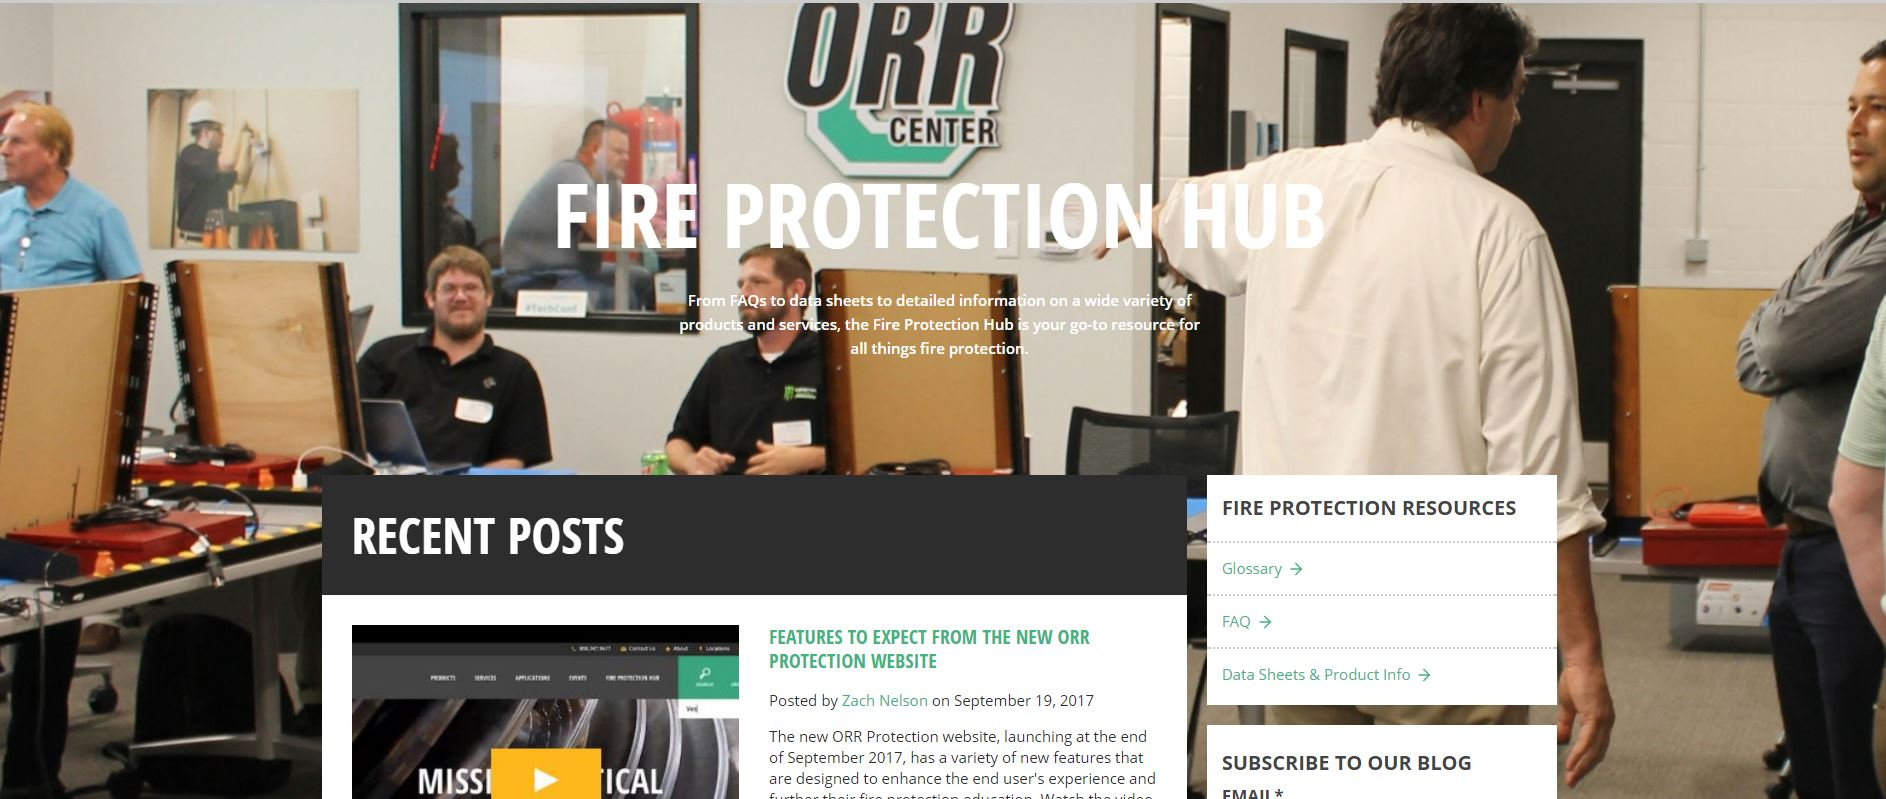 fireprotectionhub1.jpg